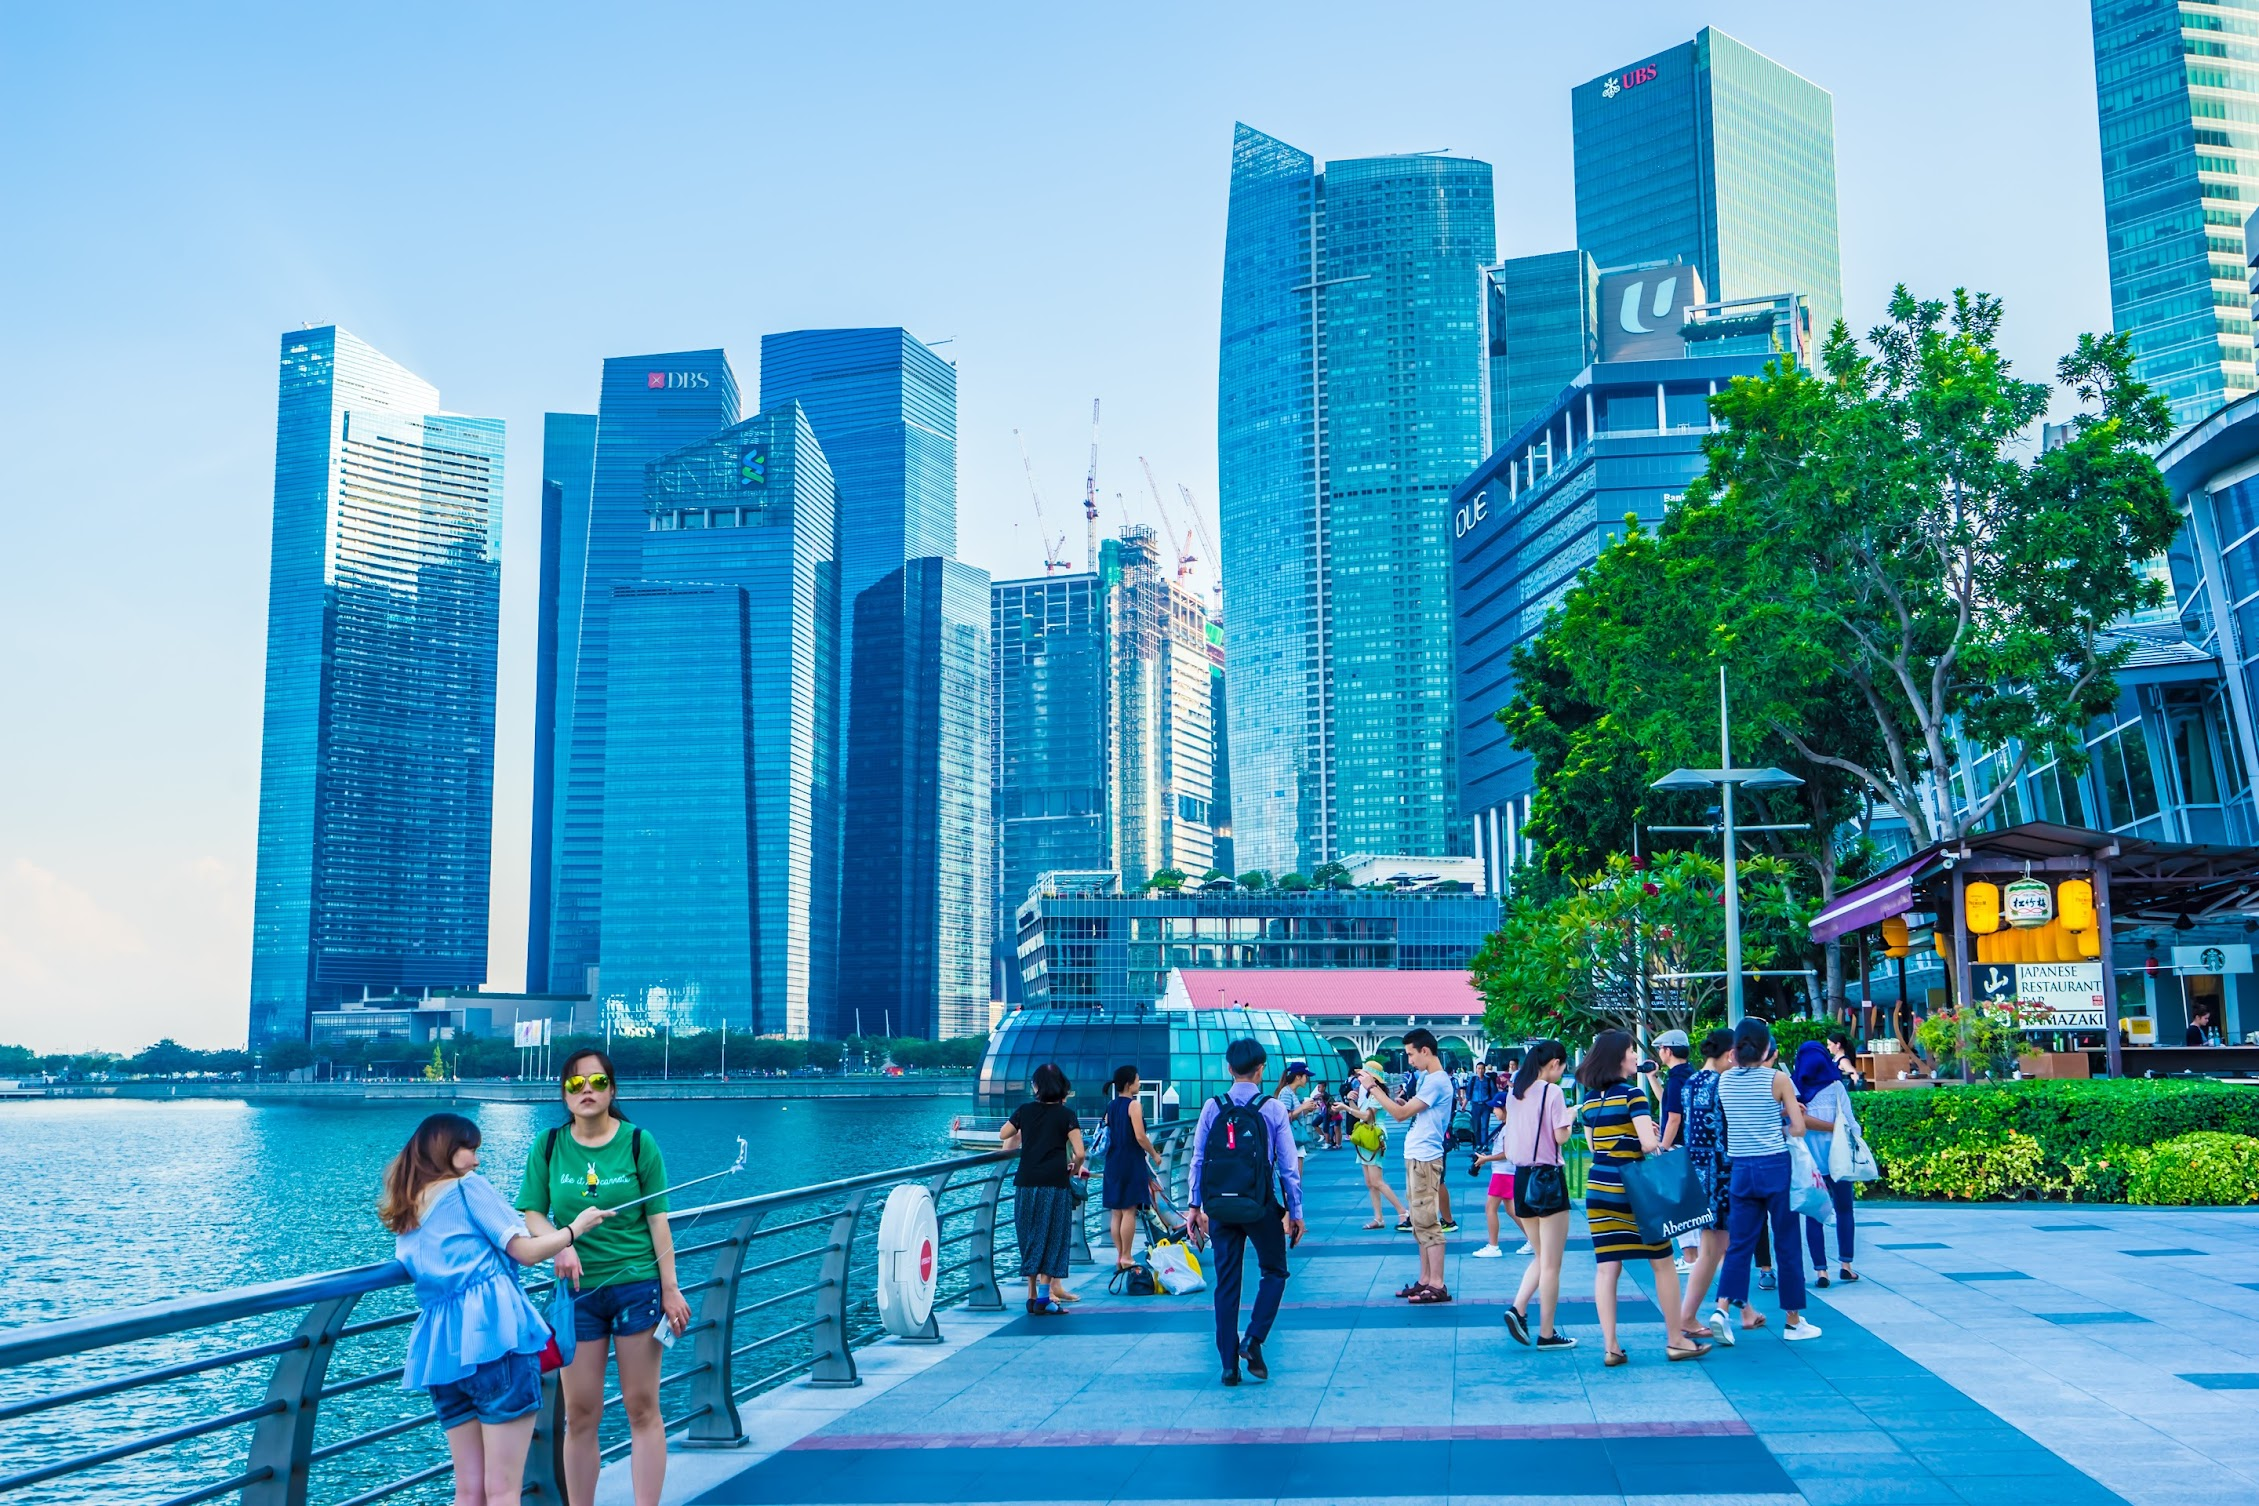 Singapore One Fullerton